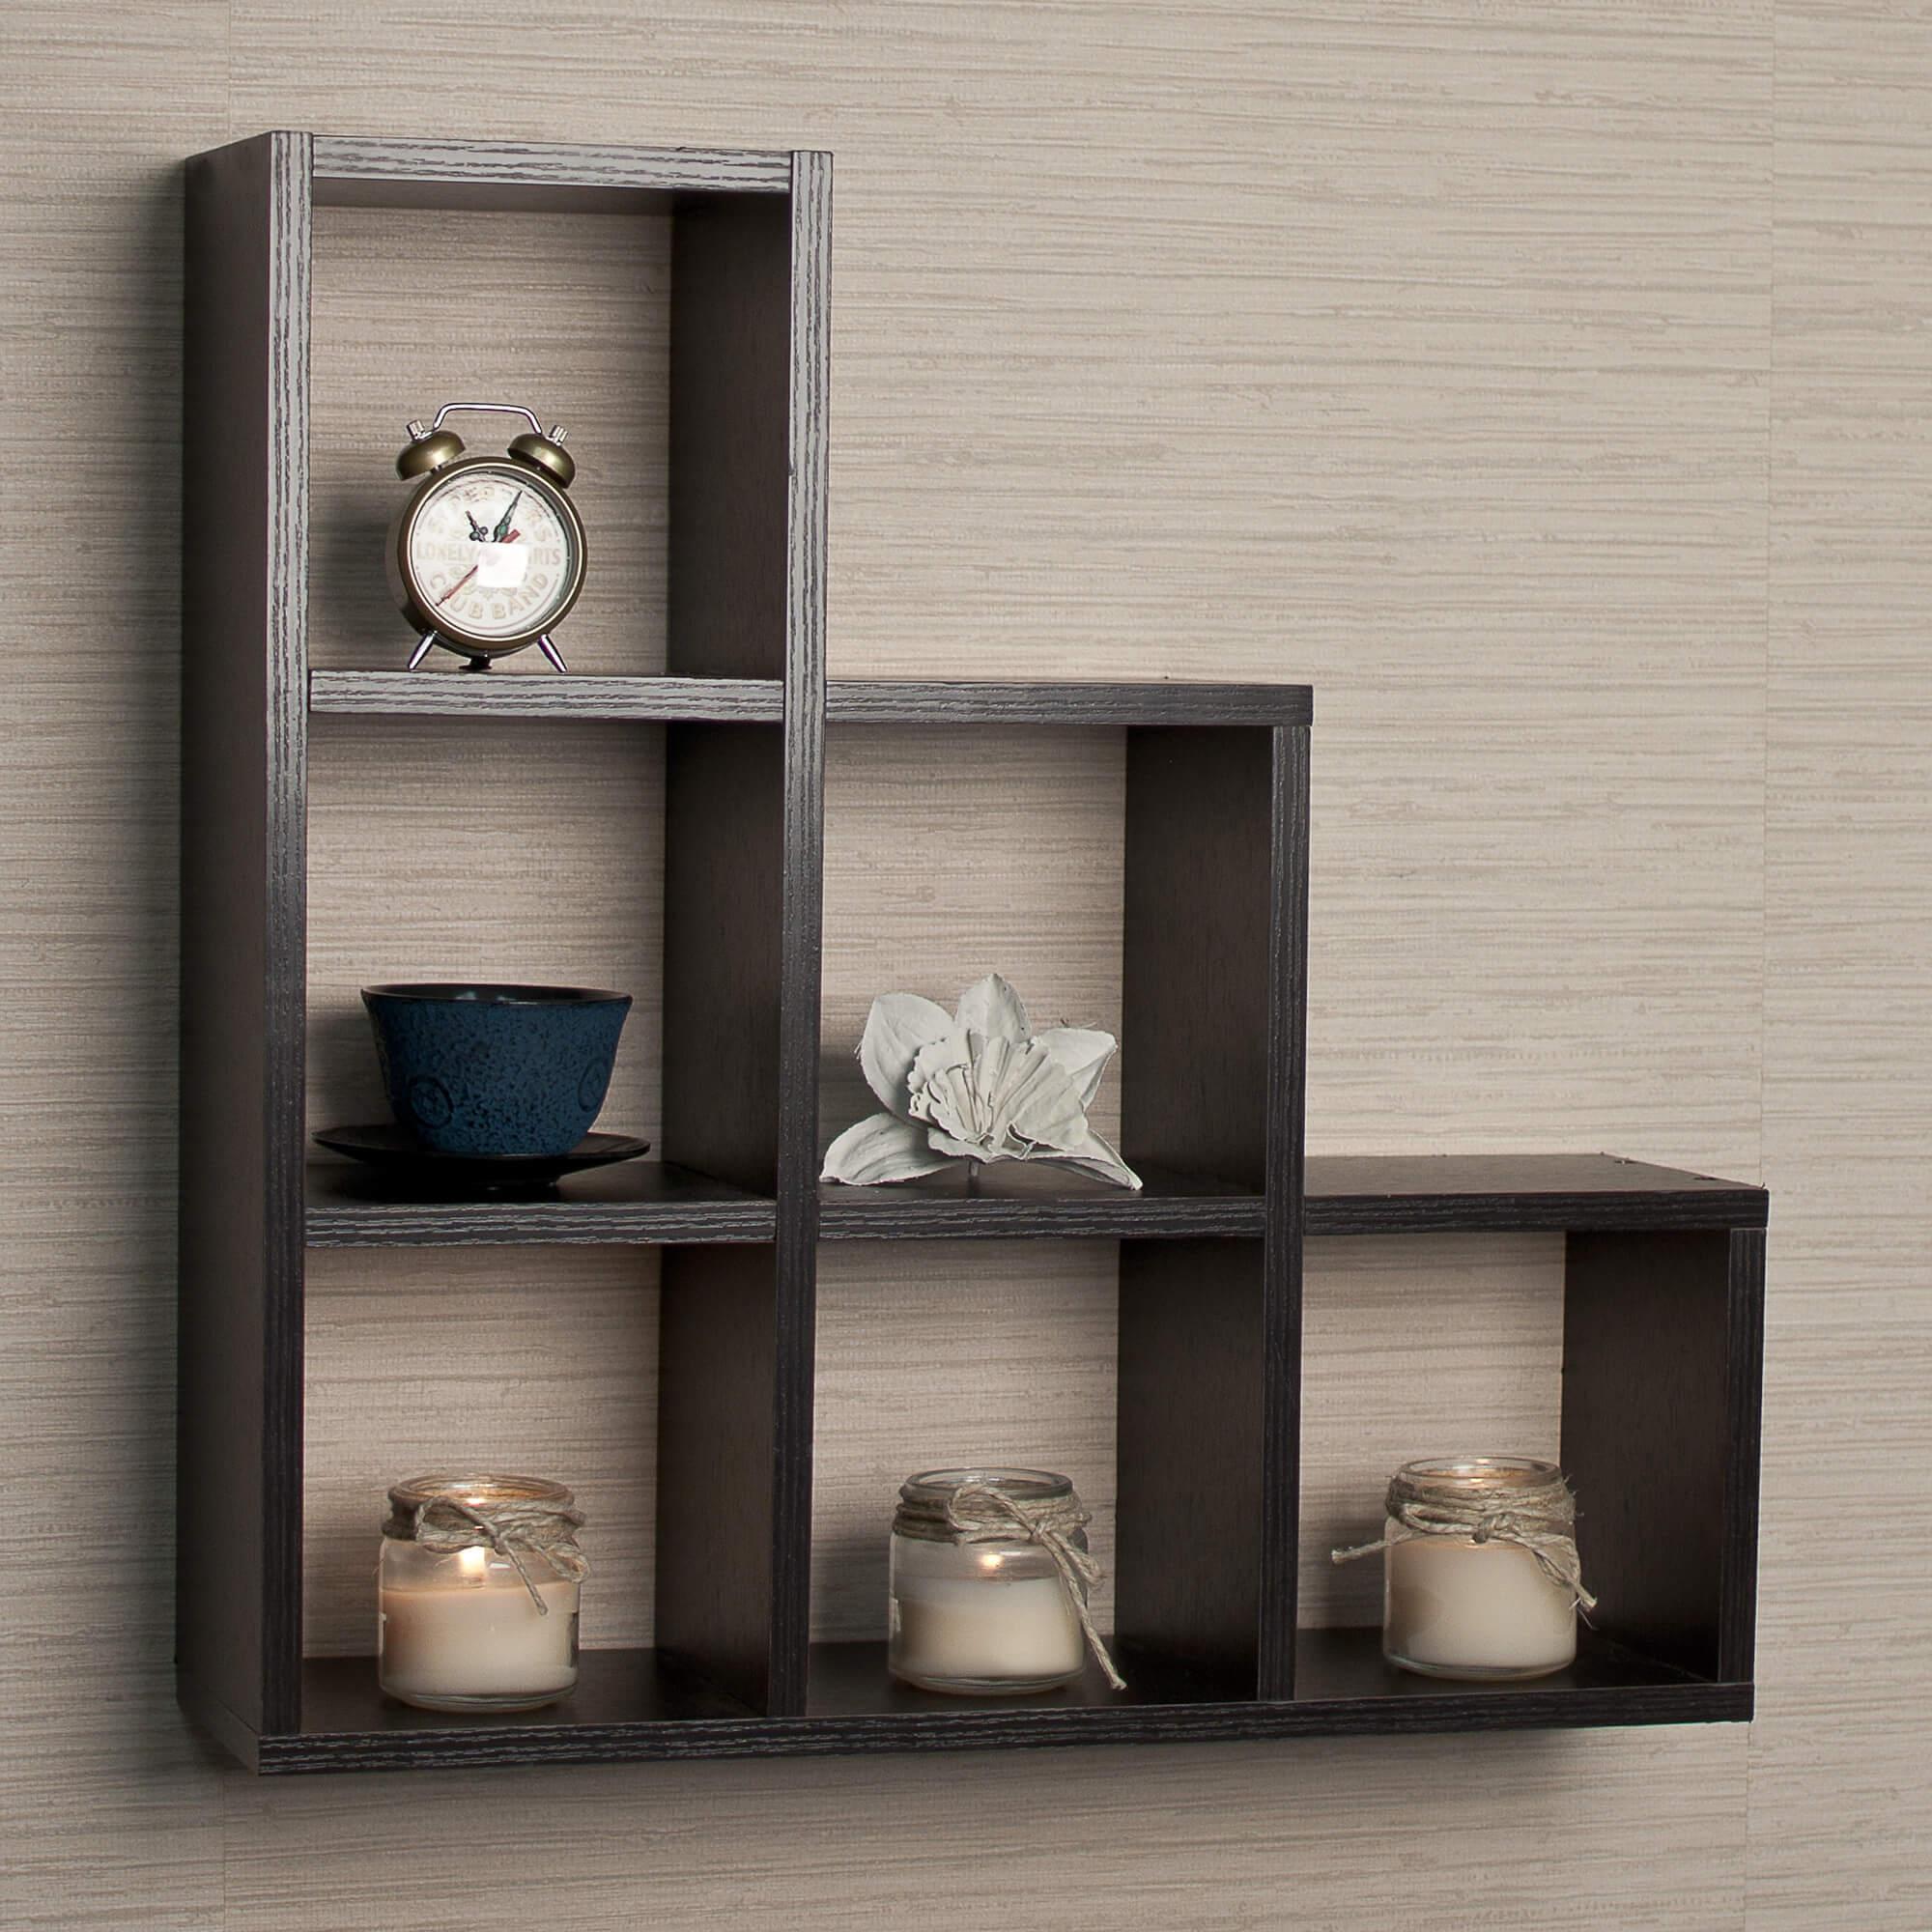 afloatingshelf kitchen and household floating shelves toronto edmonton custom shelf cabinet groupings modern wall heavy duty wood brackets most popular cabinets arrangement cal